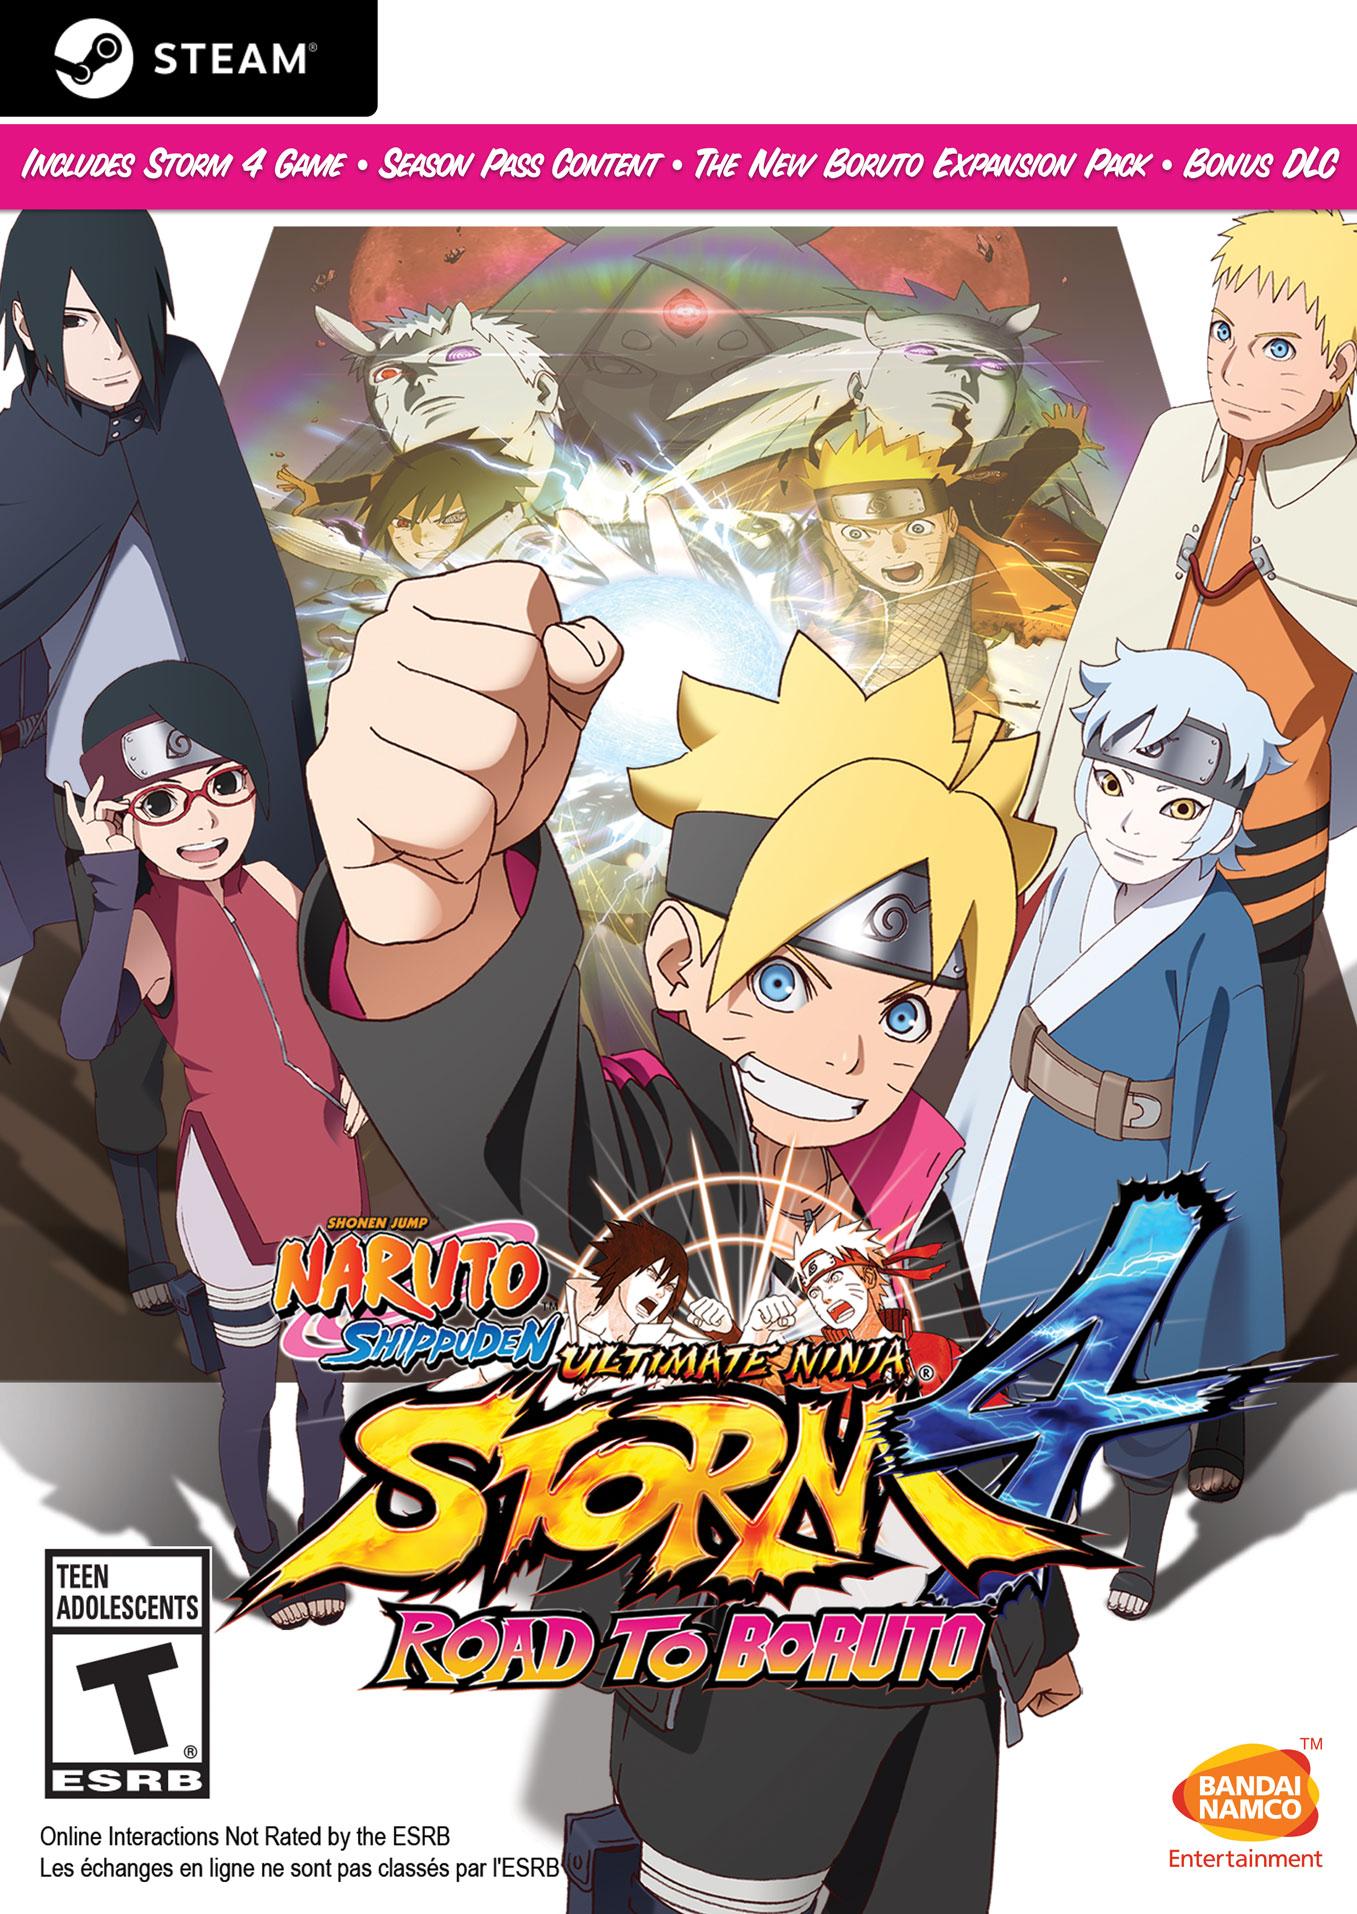 Naruto Shippuden Ultimate Ninja Storm 4 - Road to Boruto [Steam